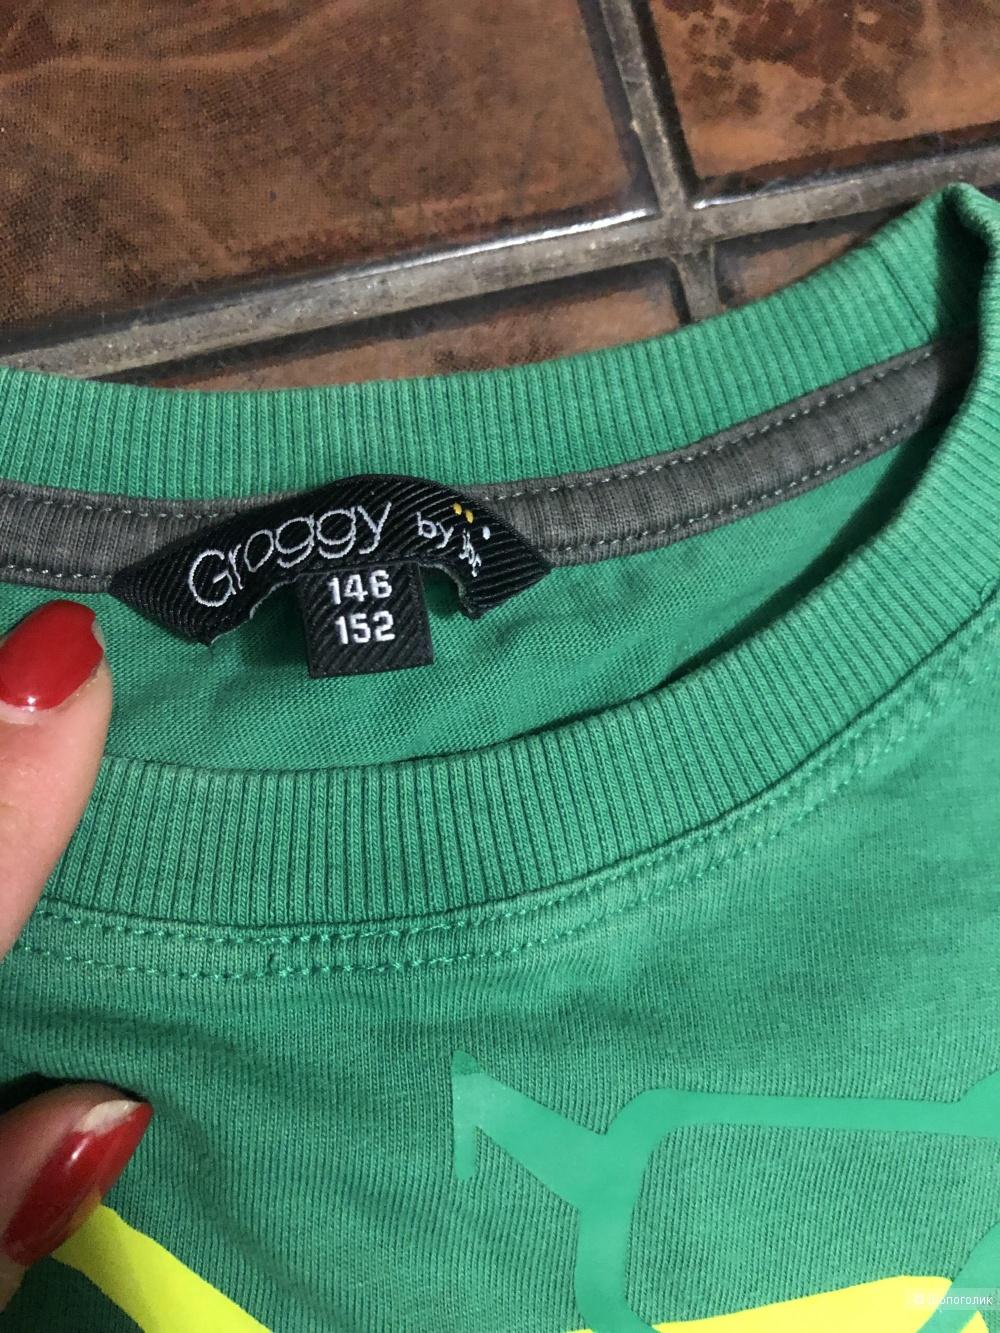 Комплект лонгсливов Groggy, DWD Party, размер 146/152